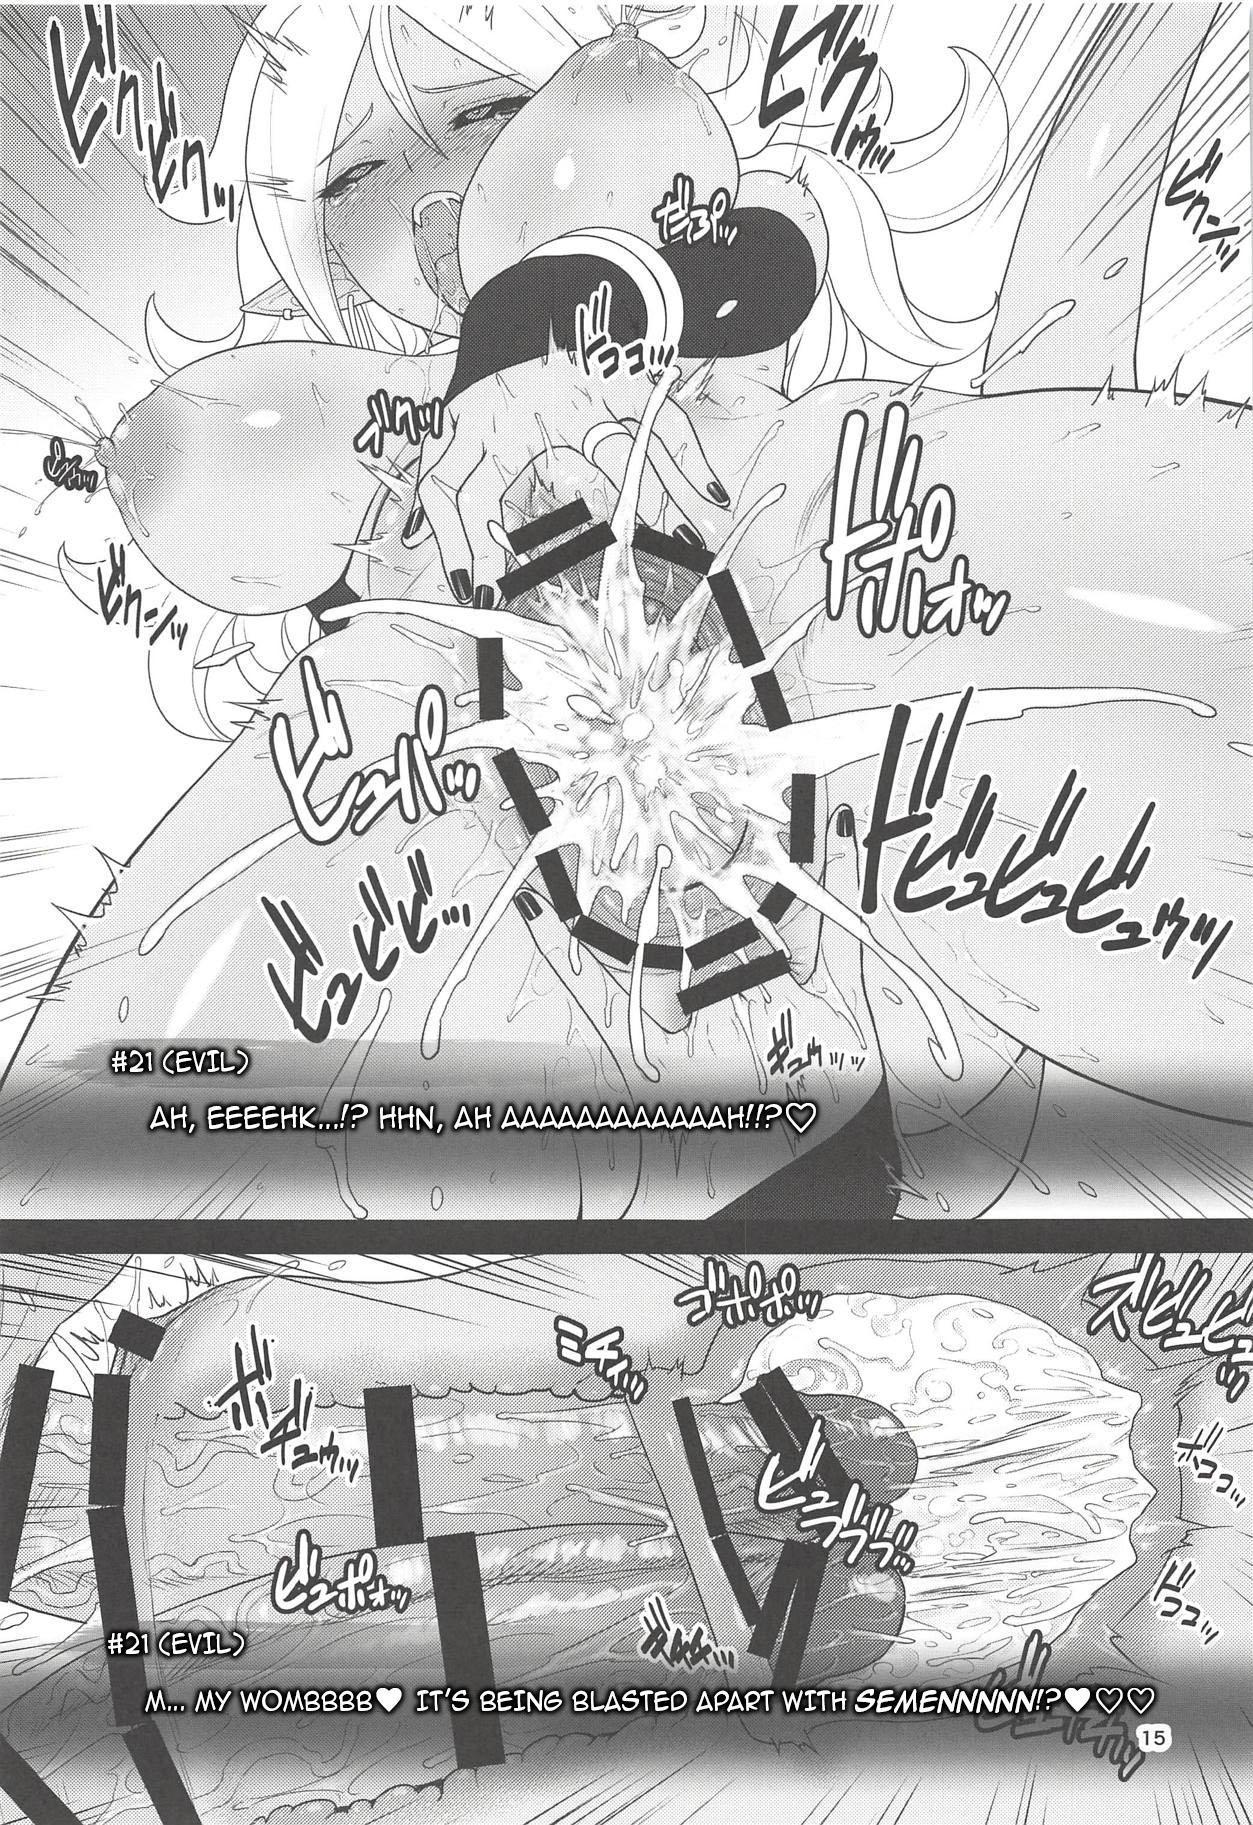 (C94) [Shinnihon Pepsitou (St.germain-sal)] 1-tsubu de 2-do Oishii | 2 for 1 Delicious Fun (Dragon Ball FighterZ) [English] {darknight} 17